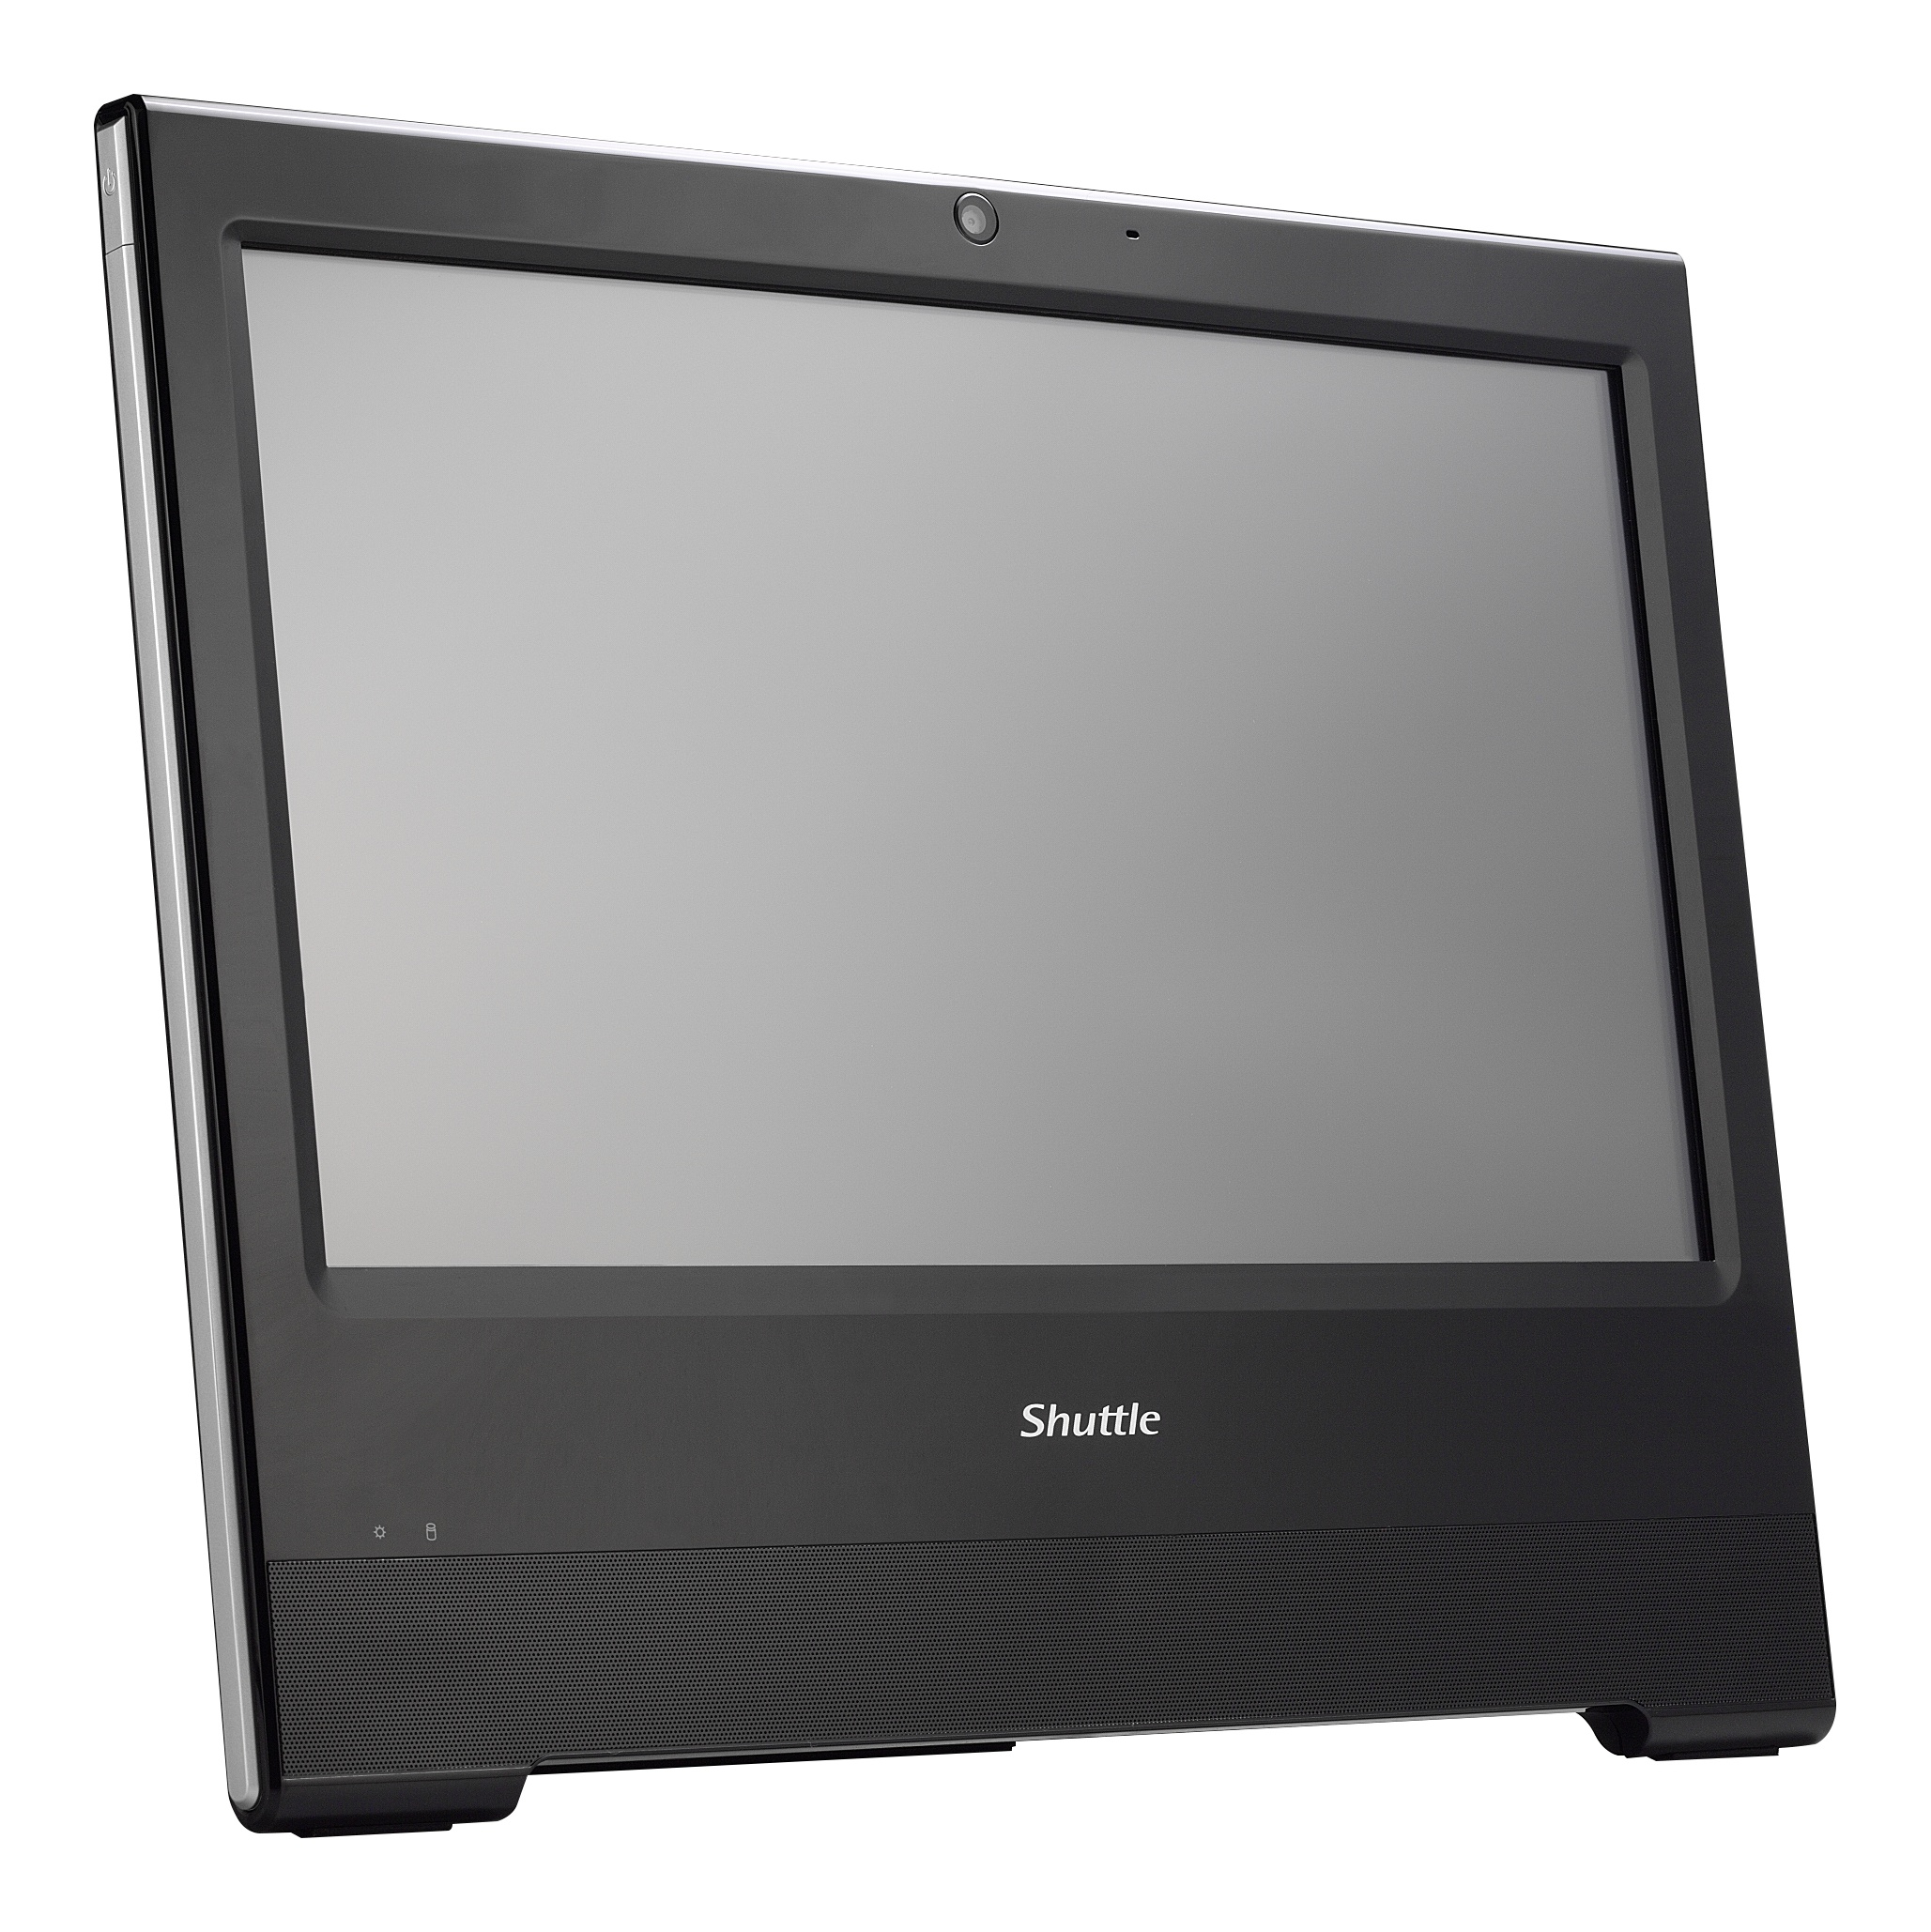 Shuttle All-in-One X50V5U3 - Barebone - Core i3 - HD 500 - DDR - CD-Laufwerk